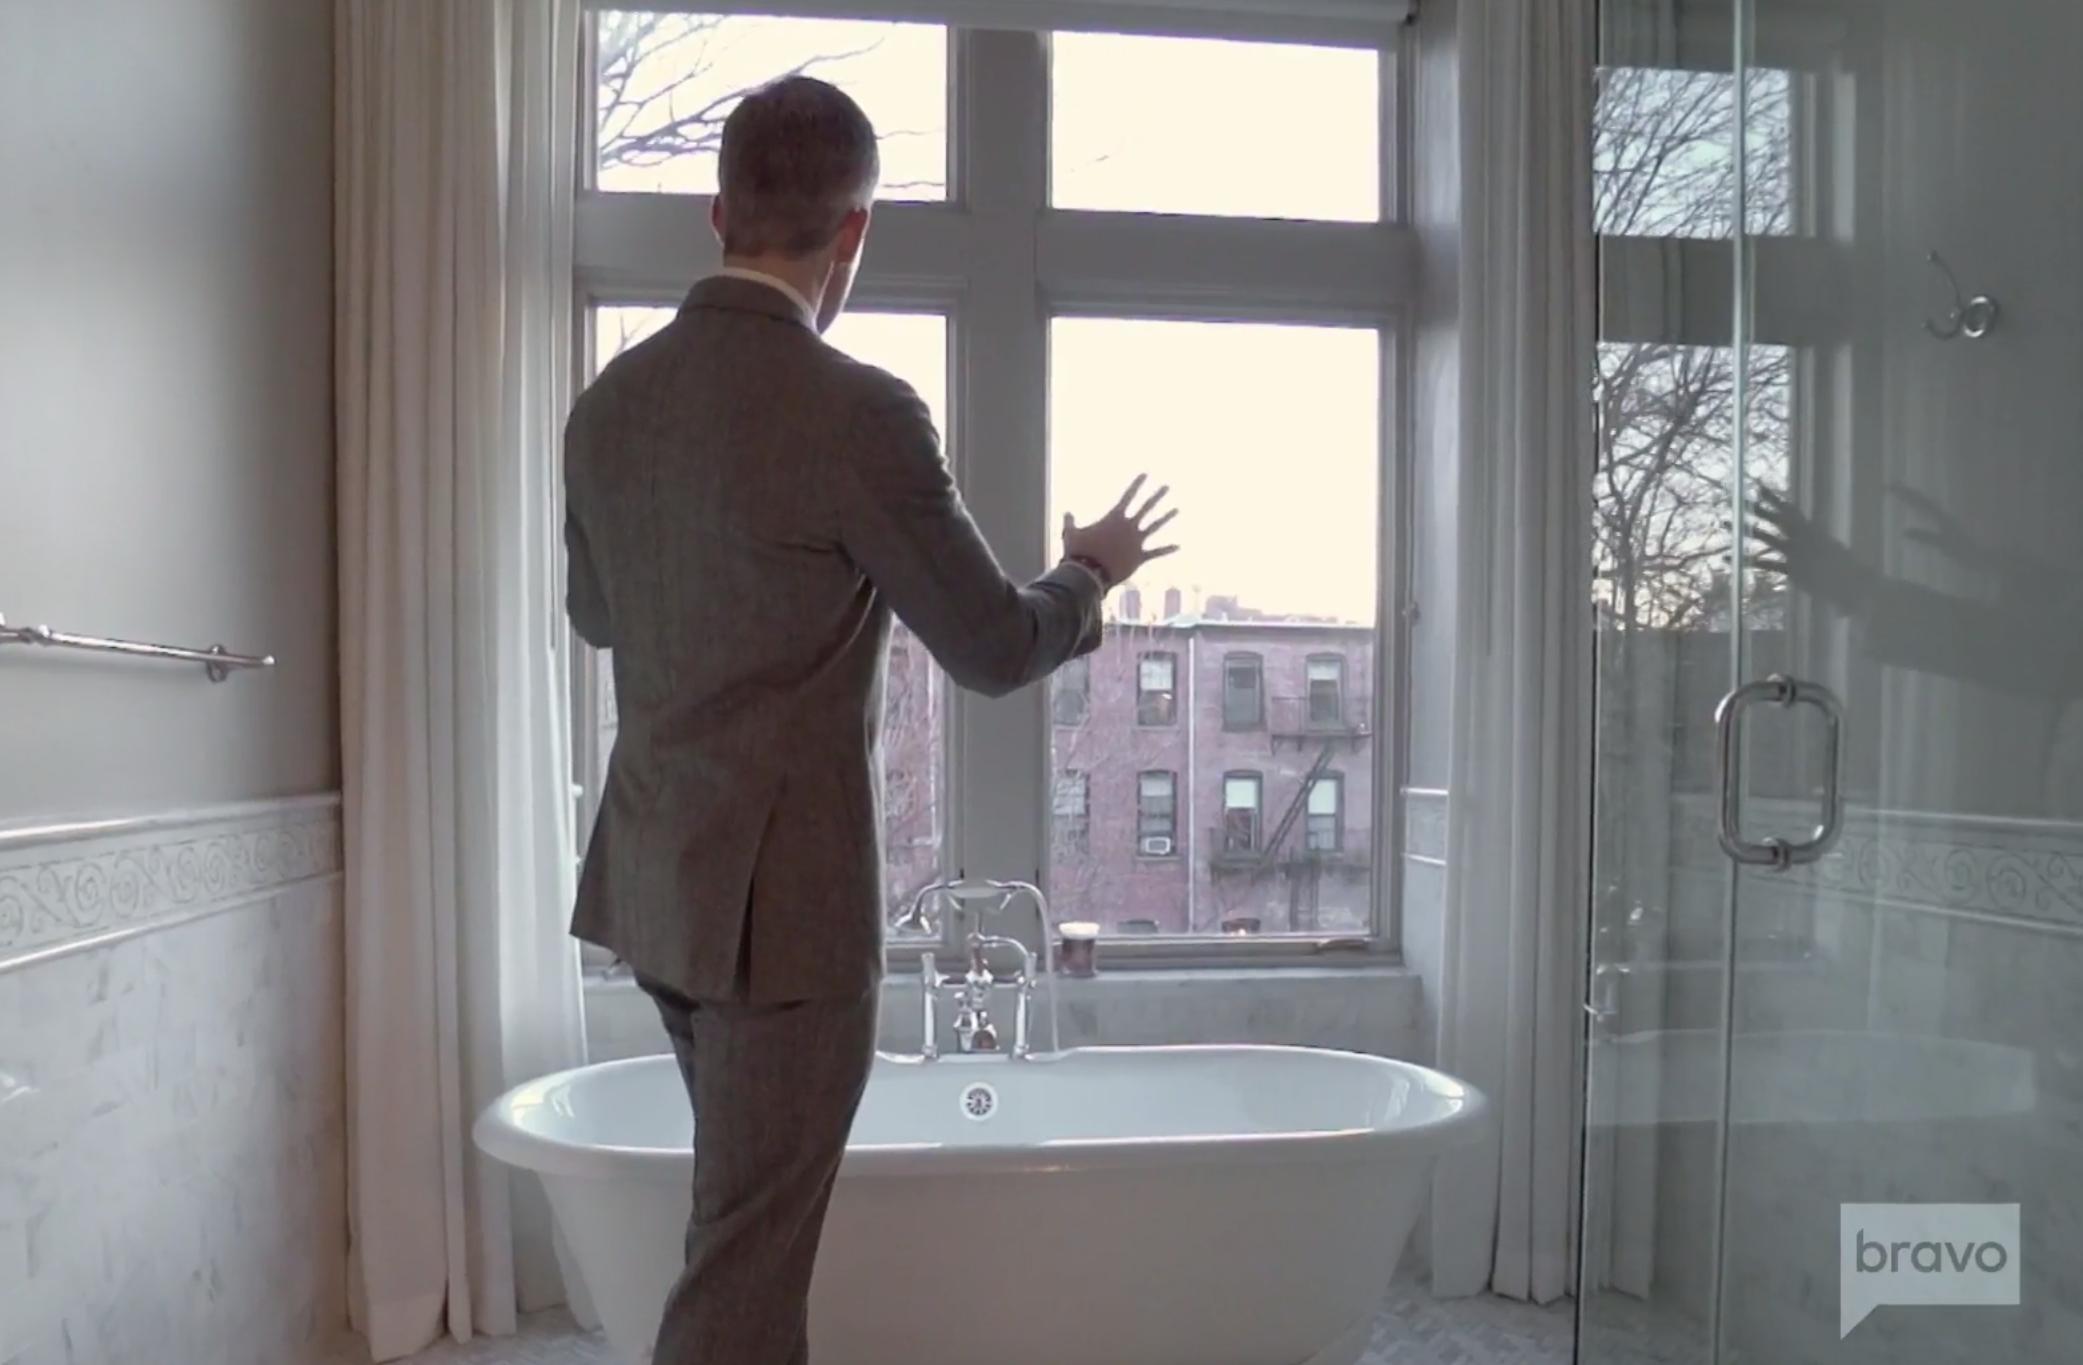 """Ryan Serhant Has a Crew of 12 Renovating His $7.6M Brooklyn Townhouse"" - - BRAVO"